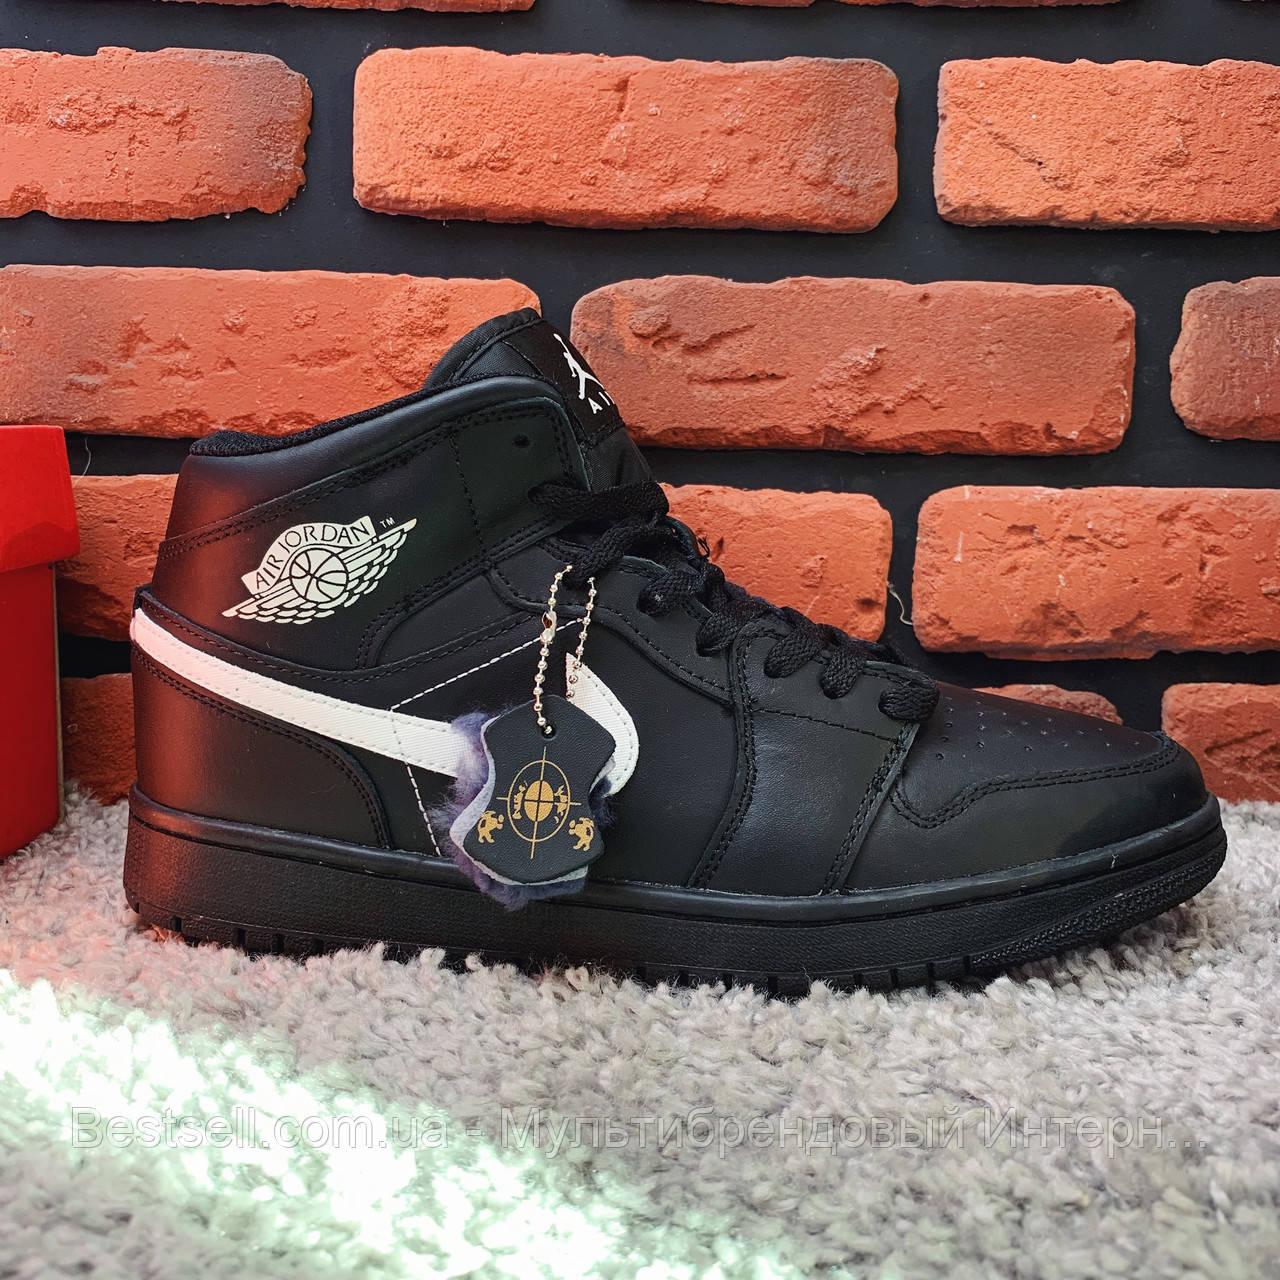 Зимние кроссовки (на меху) Nike Air Jordan 1-127 ⏩ [43 последний размер]